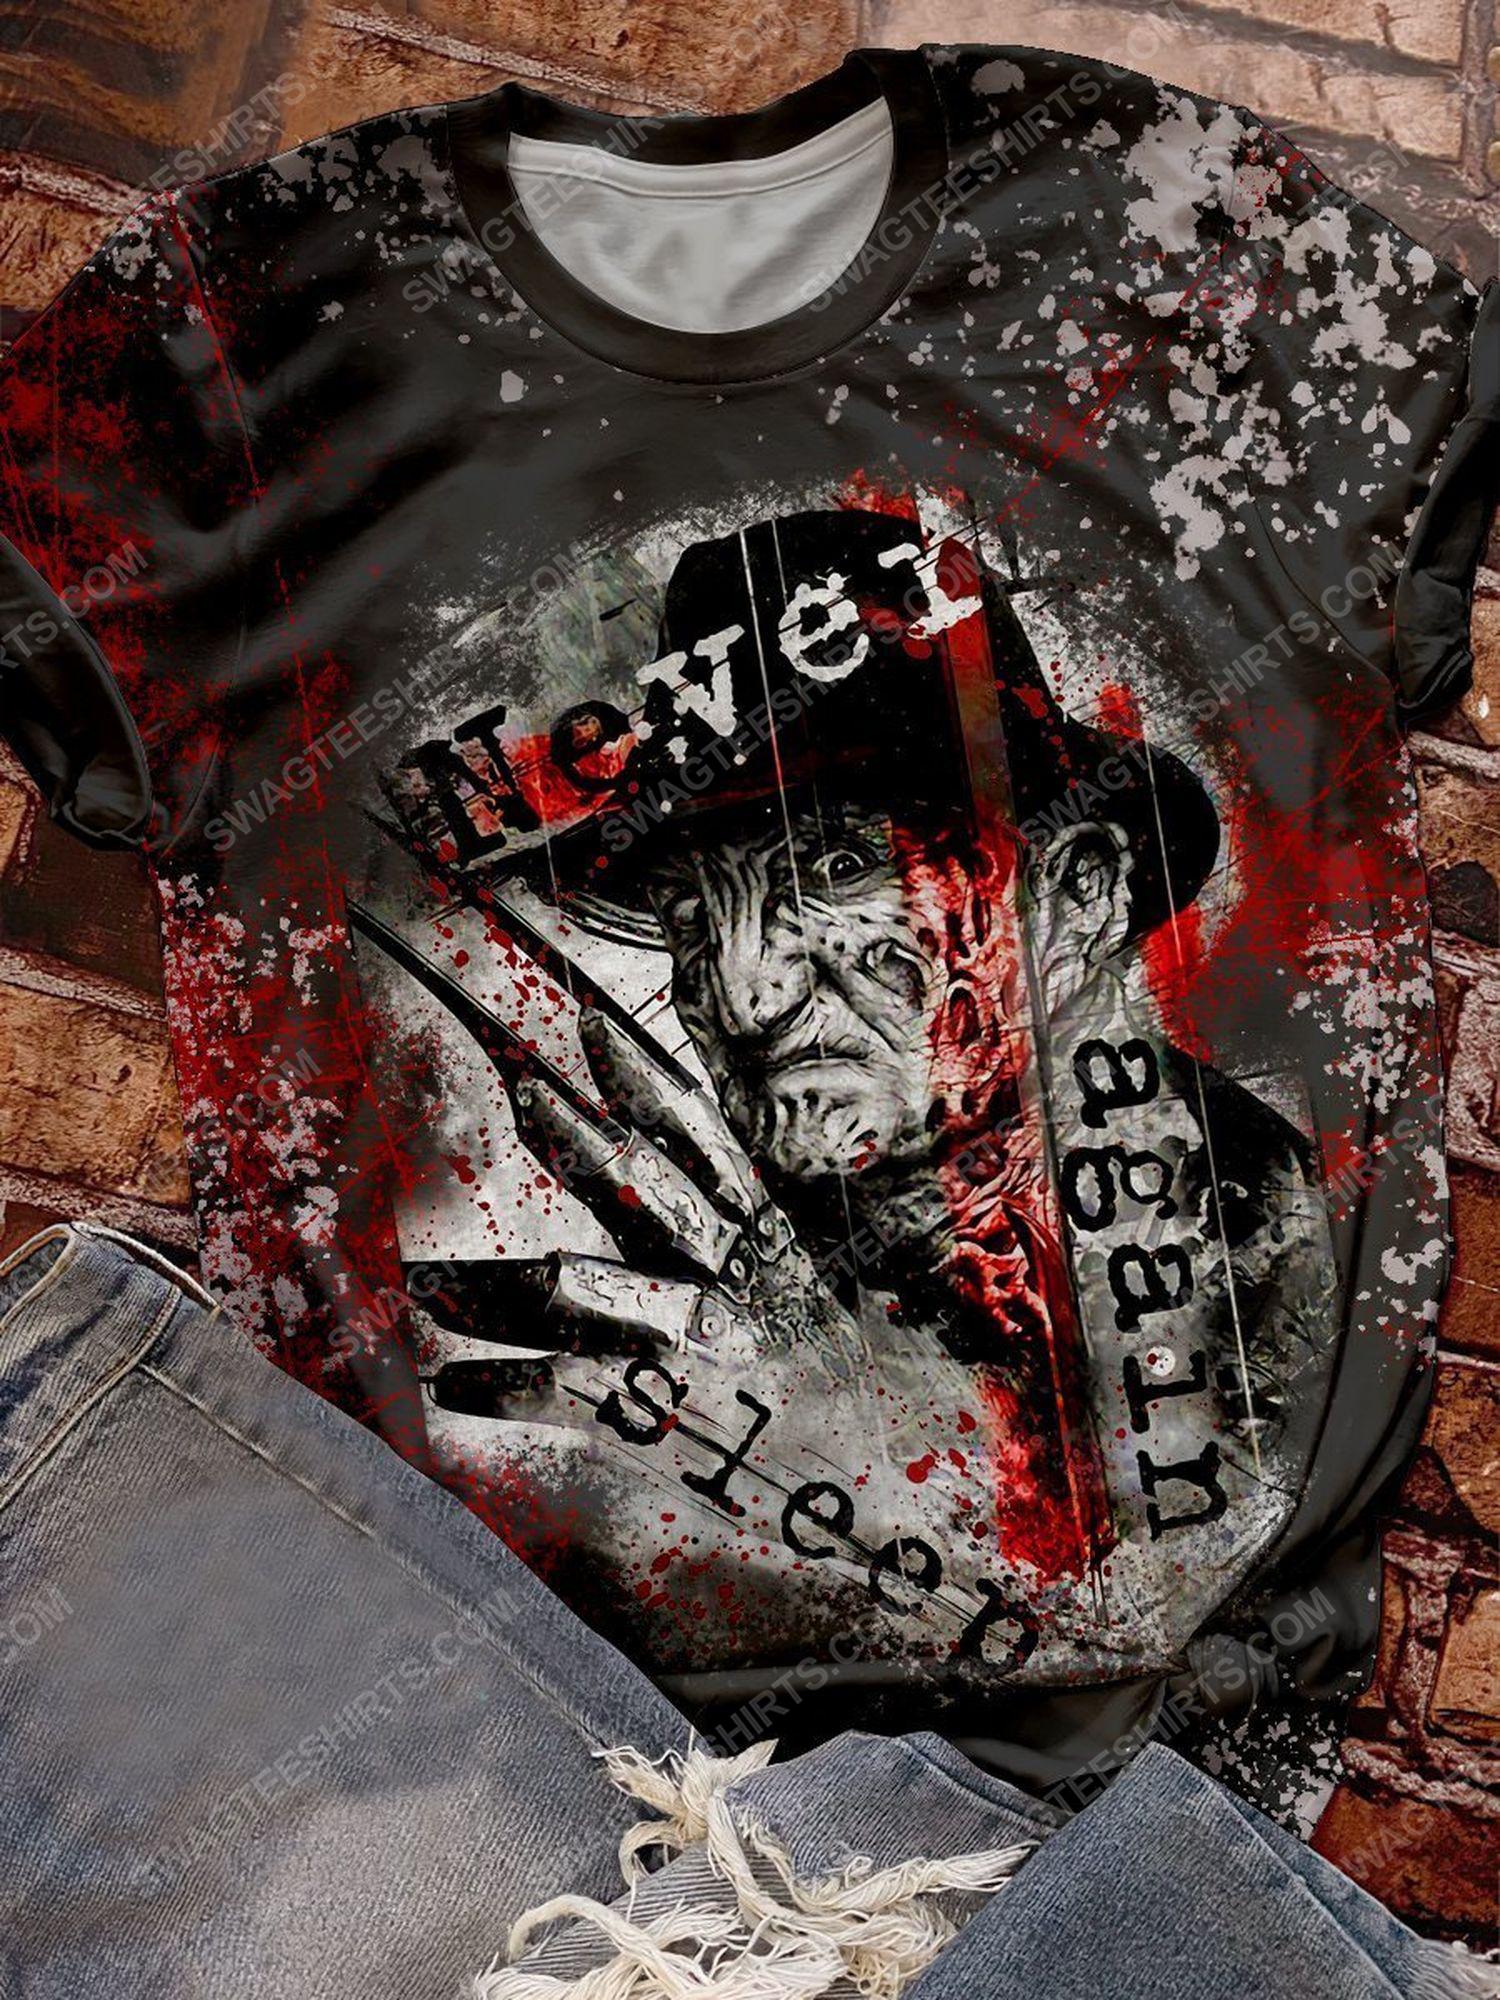 Halloween freddy's nightmares never sleep again shirt 1 - Copy (3)